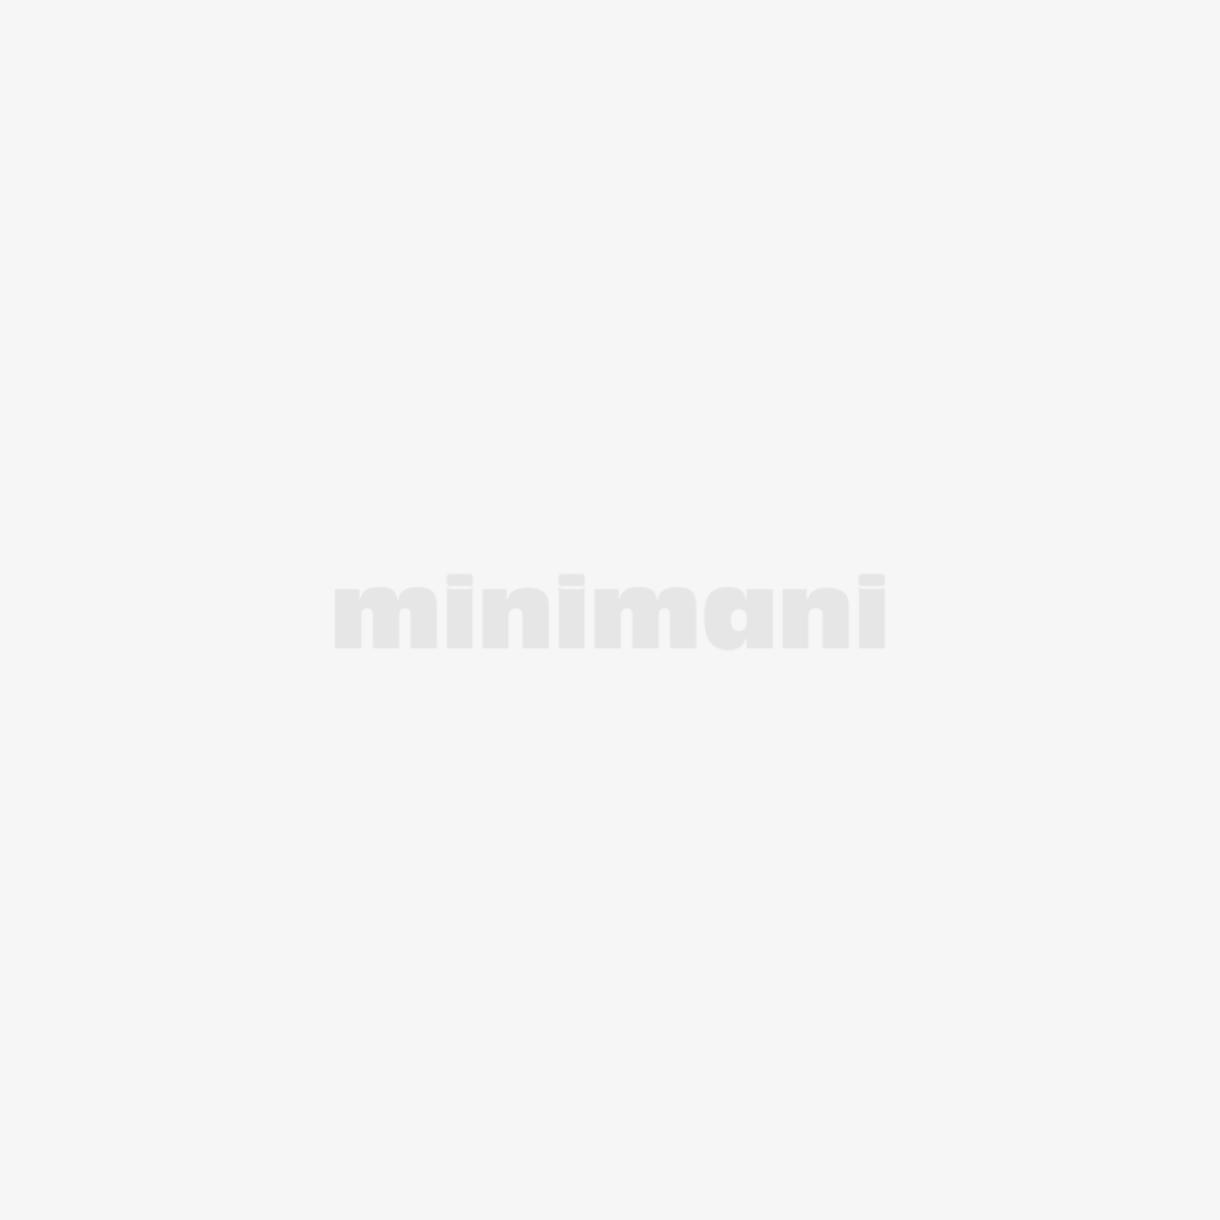 RIIMUNVARSI, SALMIAKKI MUSTA/VALK, HORSE COMFORT